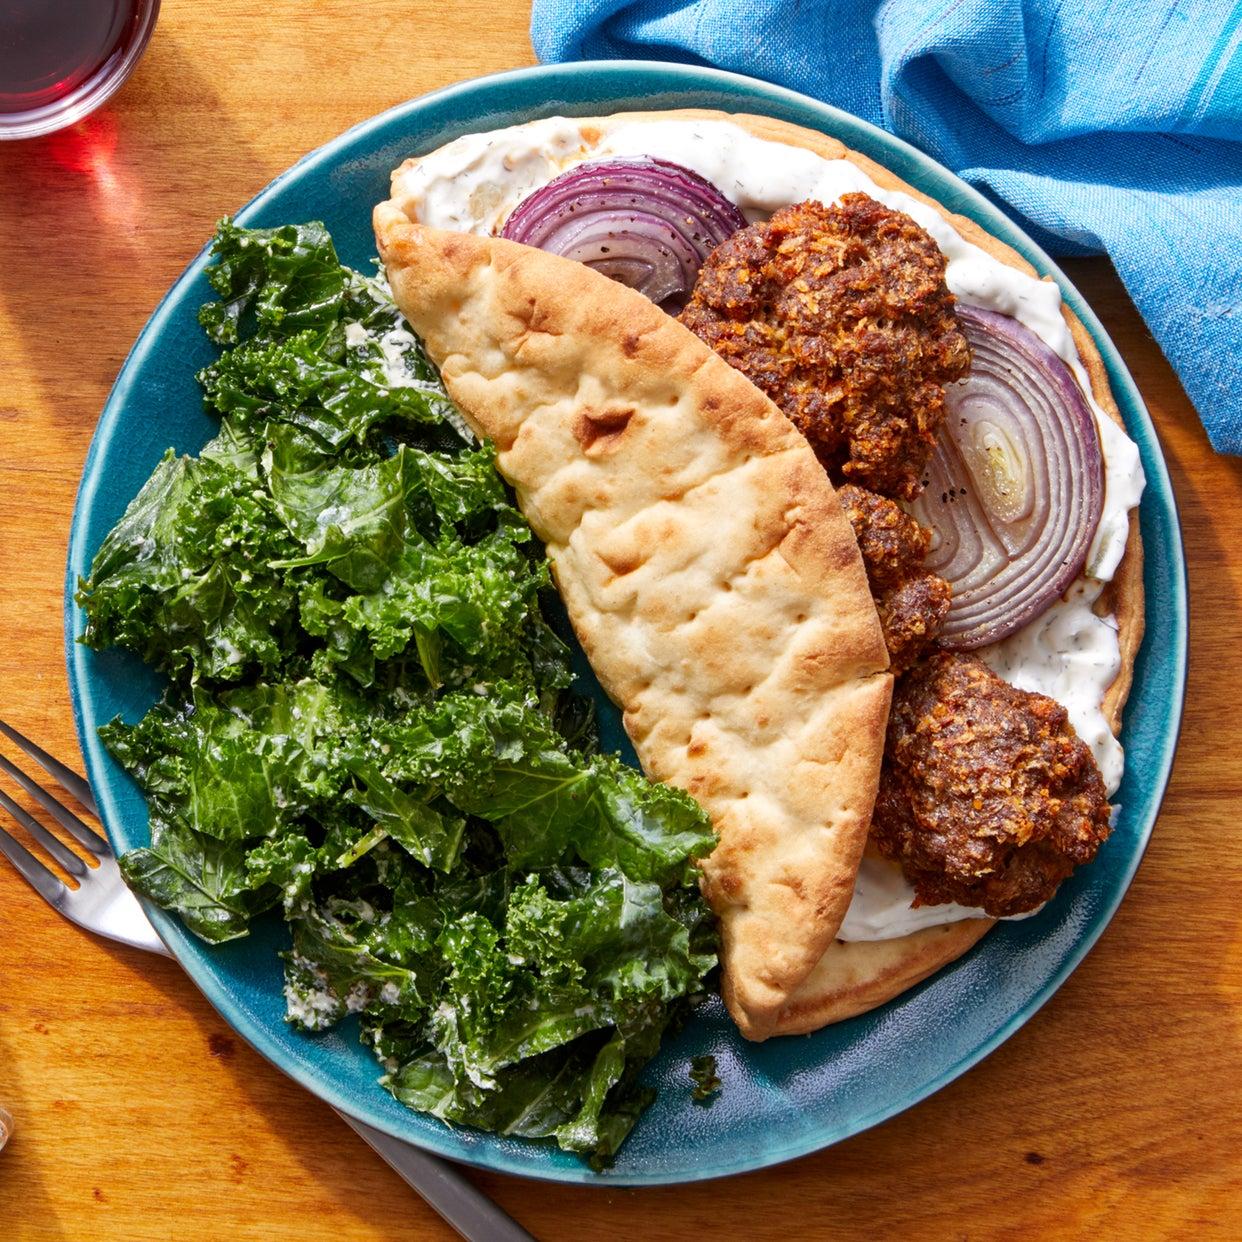 Oven-Baked Meatball Pitas with Tzatziki & Marinated Kale